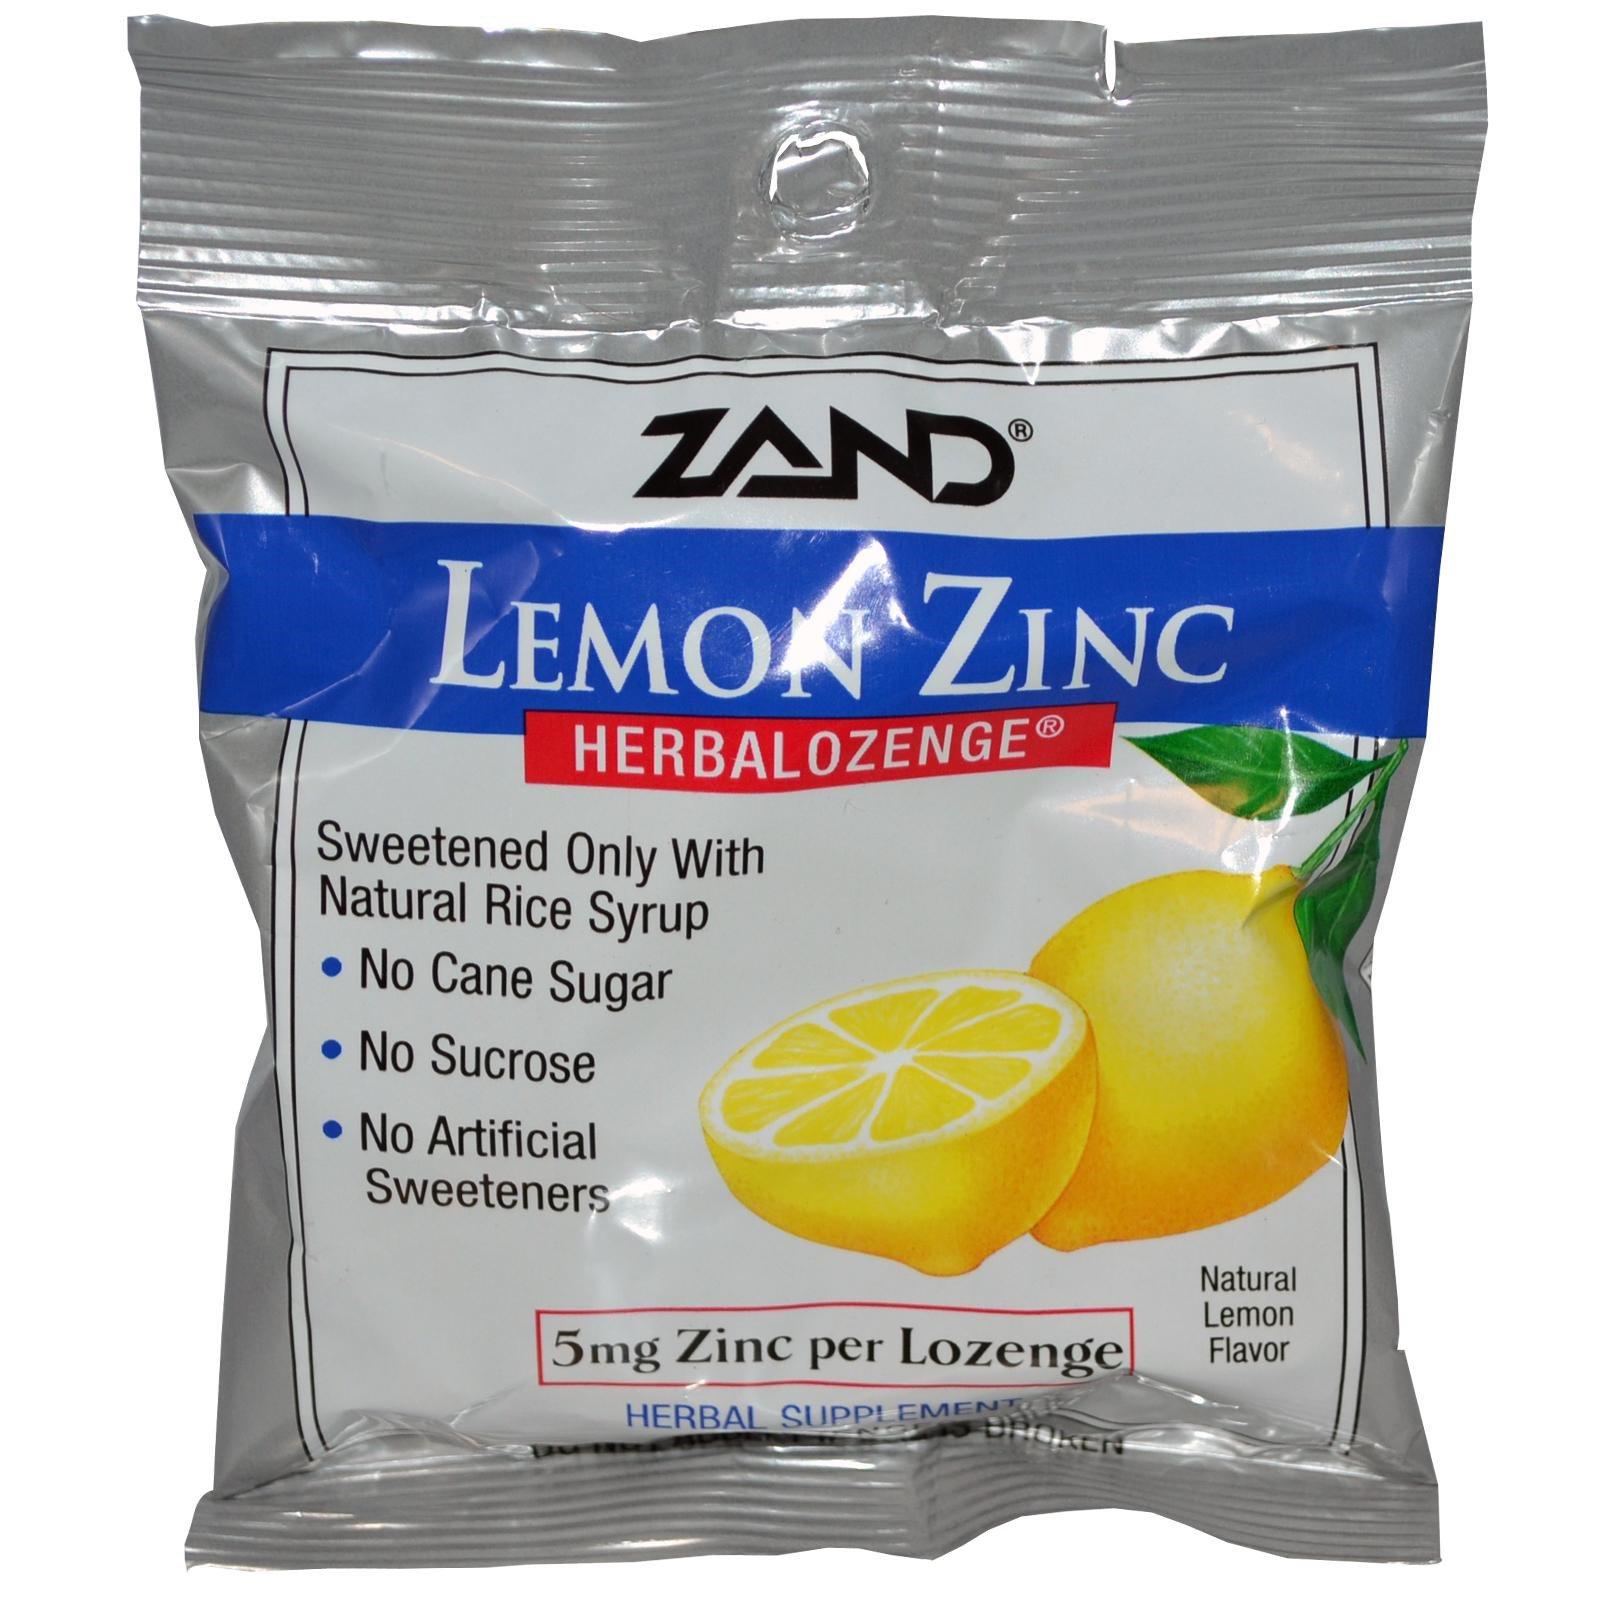 Zand, Лимон цинк, Herbalozenge, с натуральным ароматом лимона, 15 леденцов